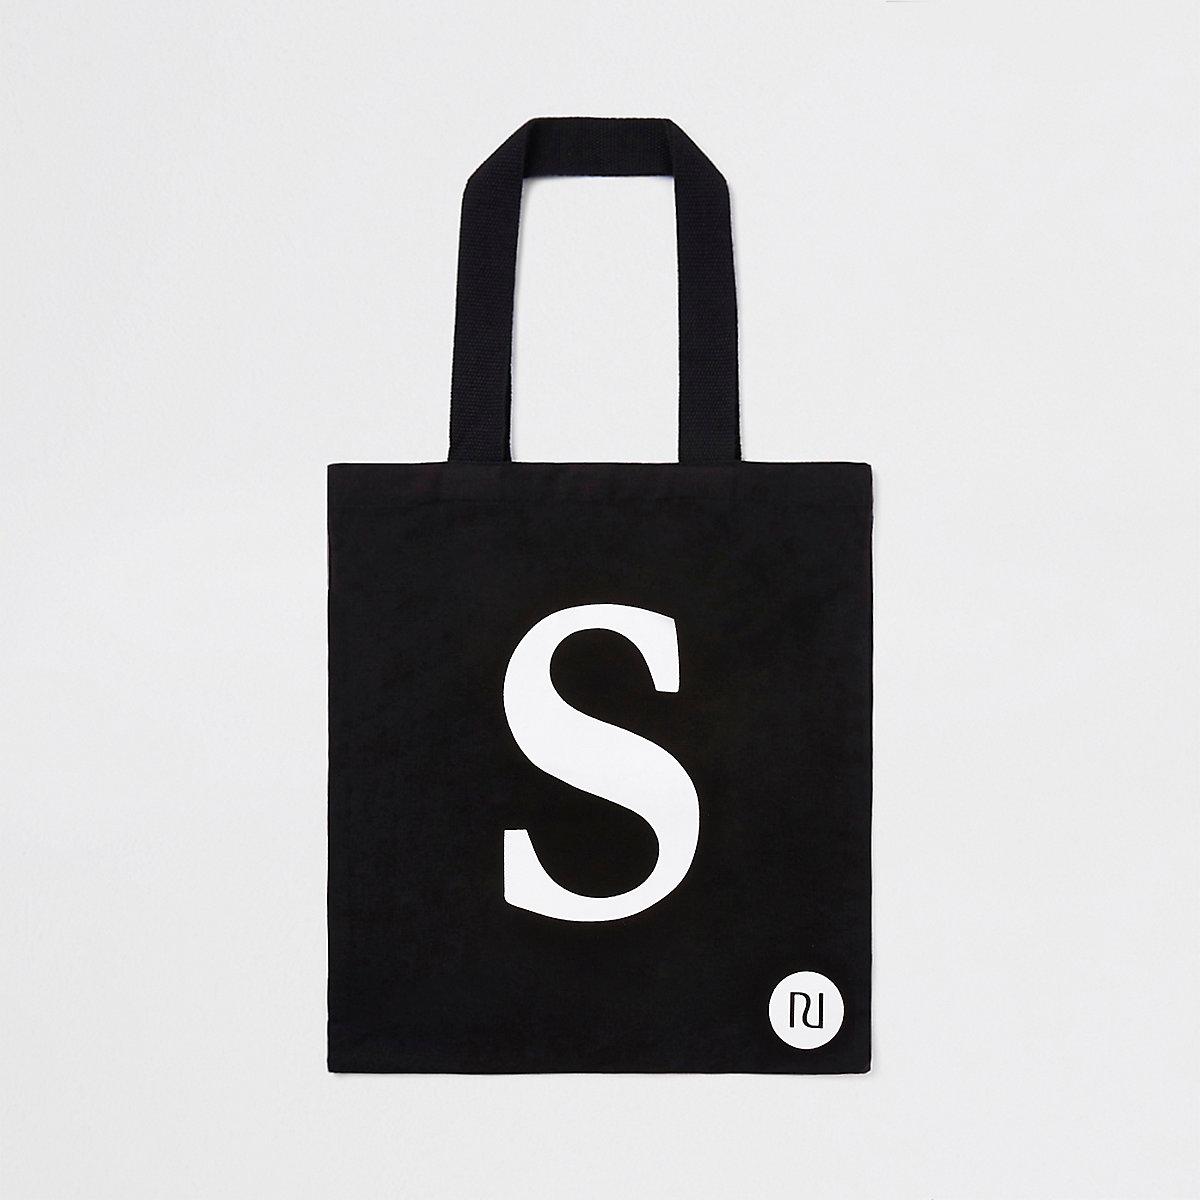 Black 'S' initial shopper tote bag